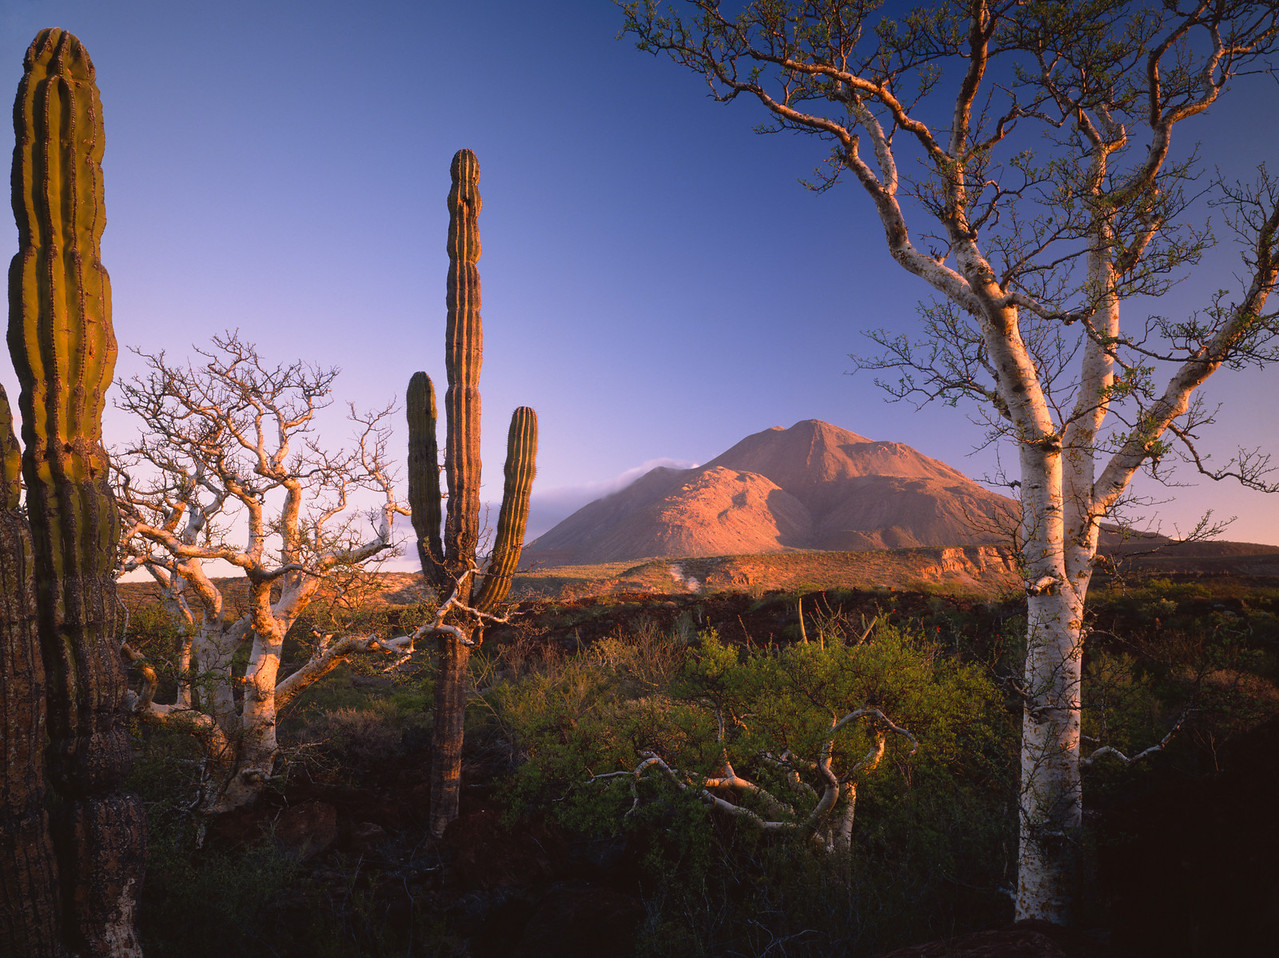 Baja Sur, Tres Virgenes, MEX/elephant trees(Pachycormus discolor)L& (Bursera microphylla)cardon189hxc